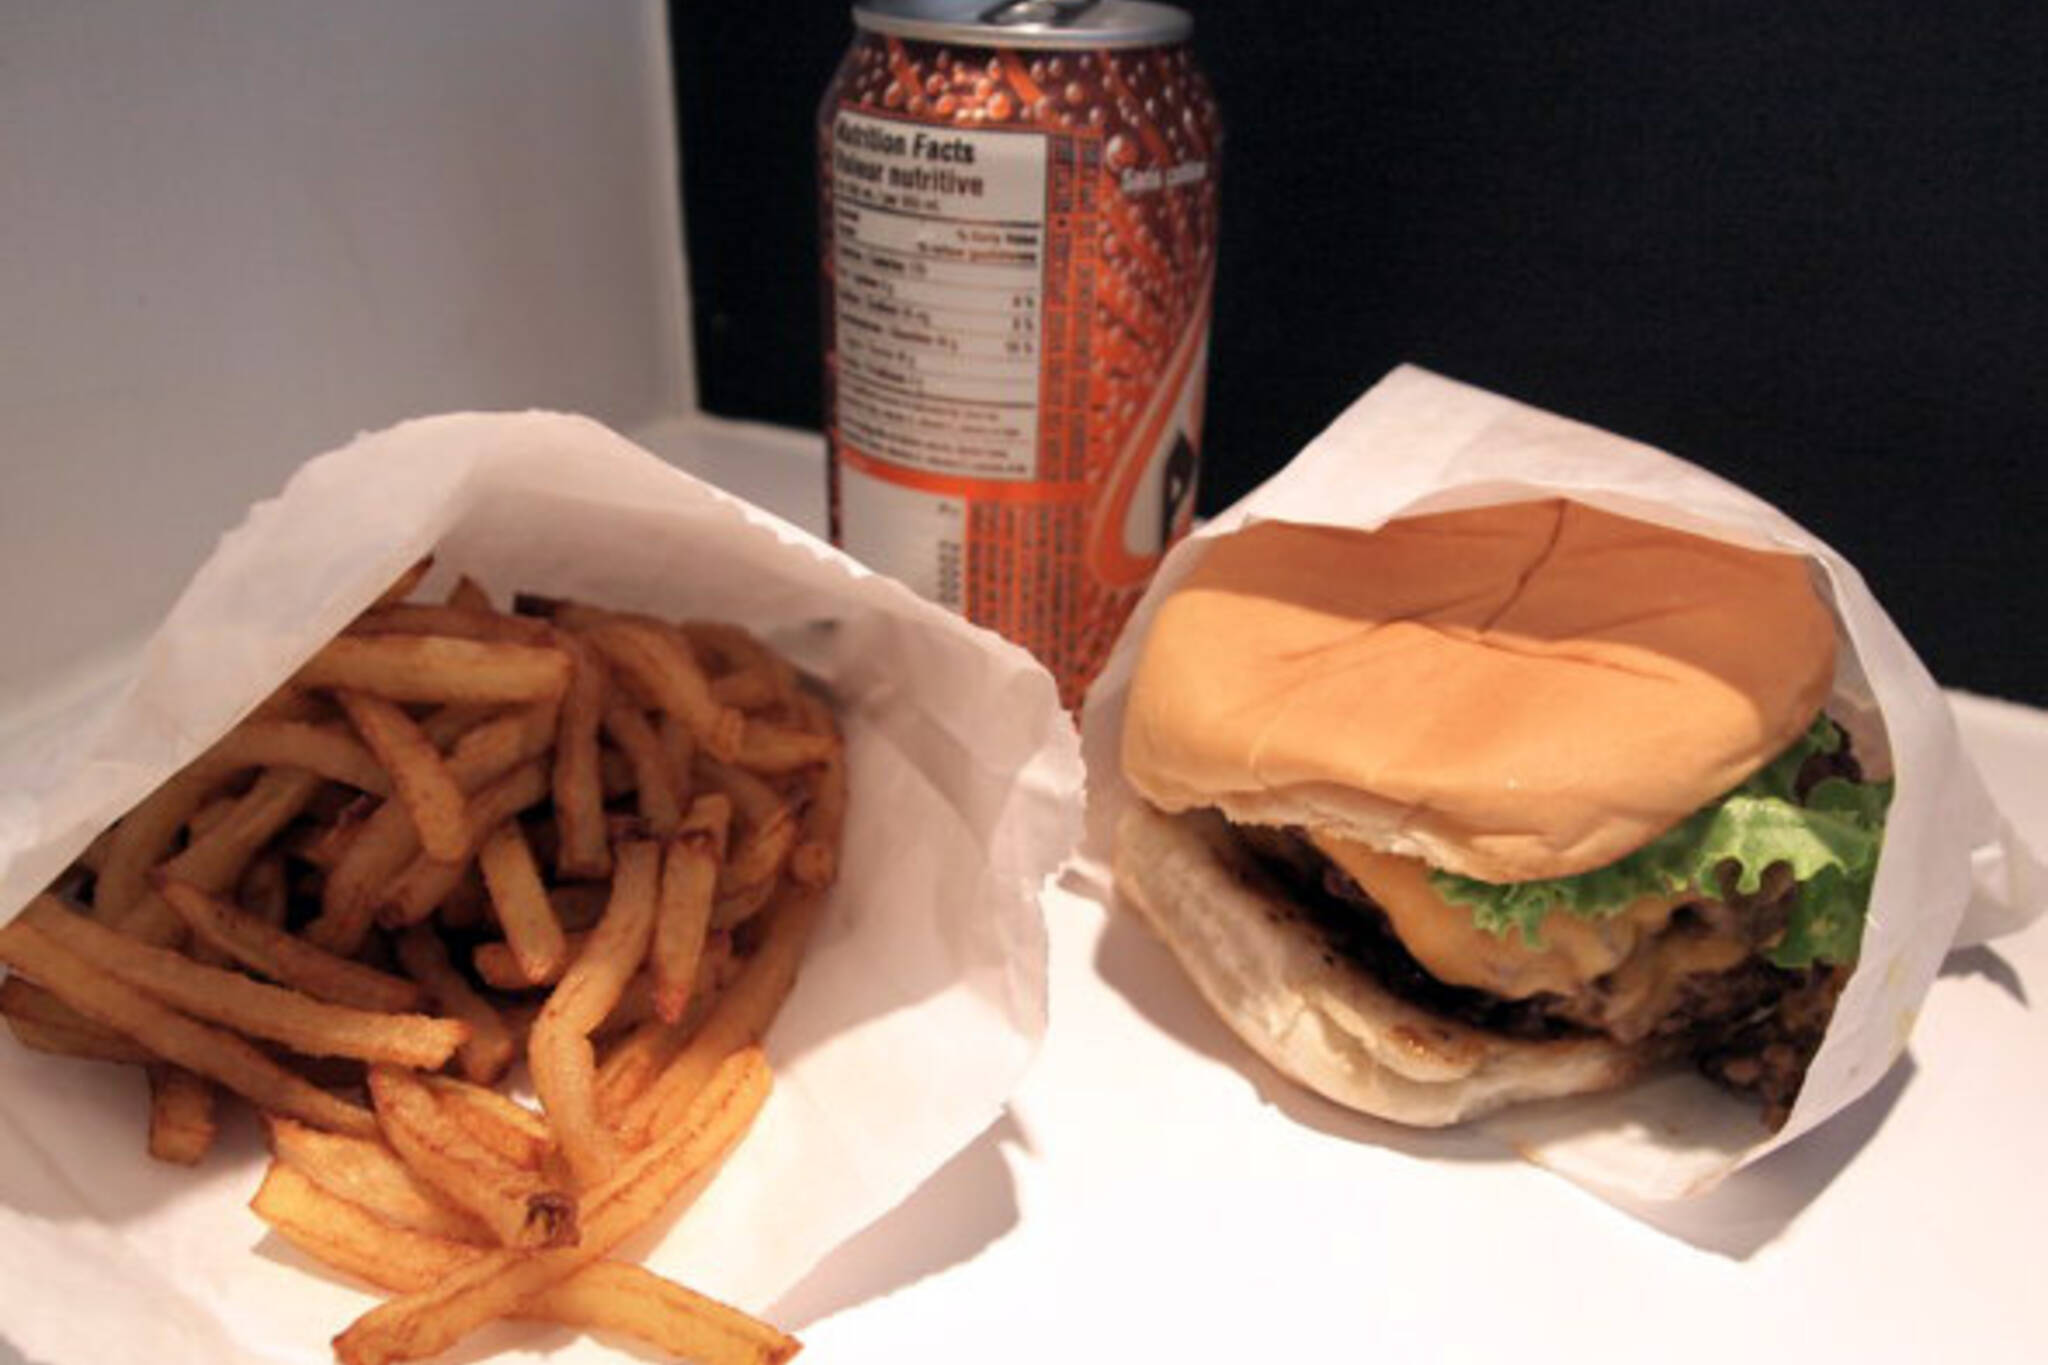 The Burger's Priest Toronto